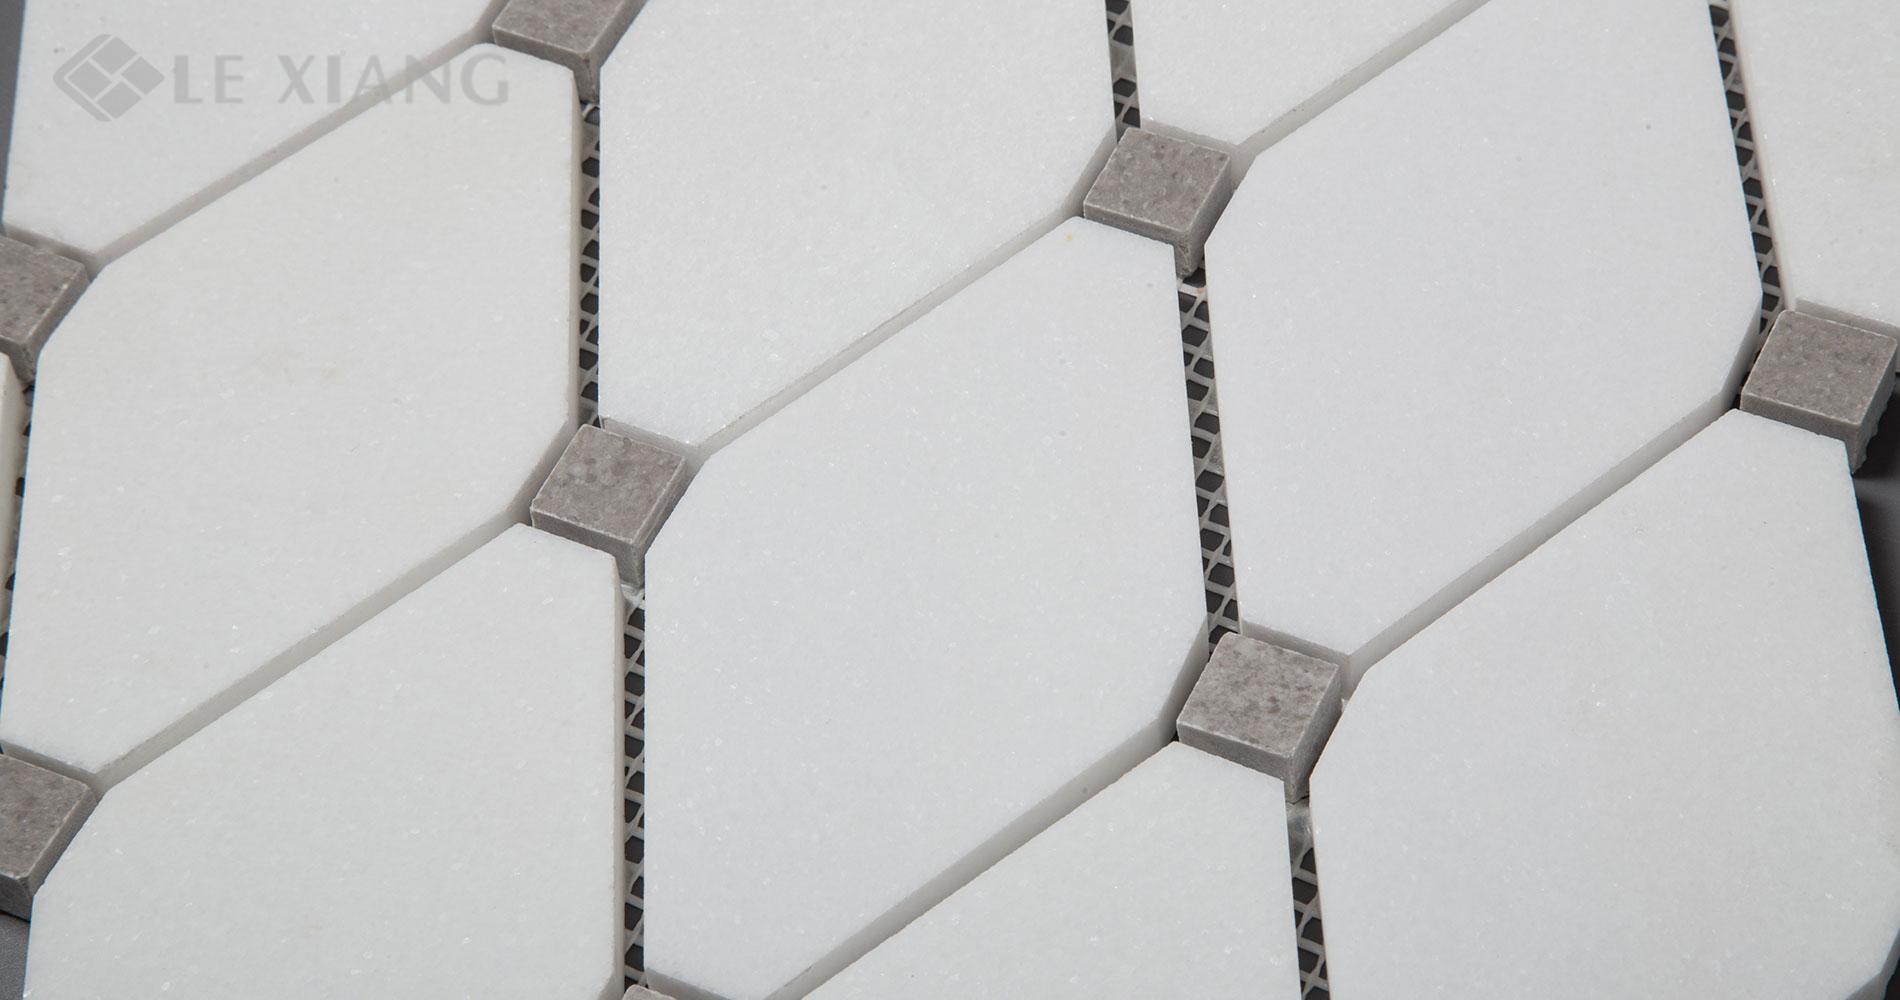 Long-Octagon-White-Thassos-Marble-Mosaic-Tile-Kitchen-Backsplash-2